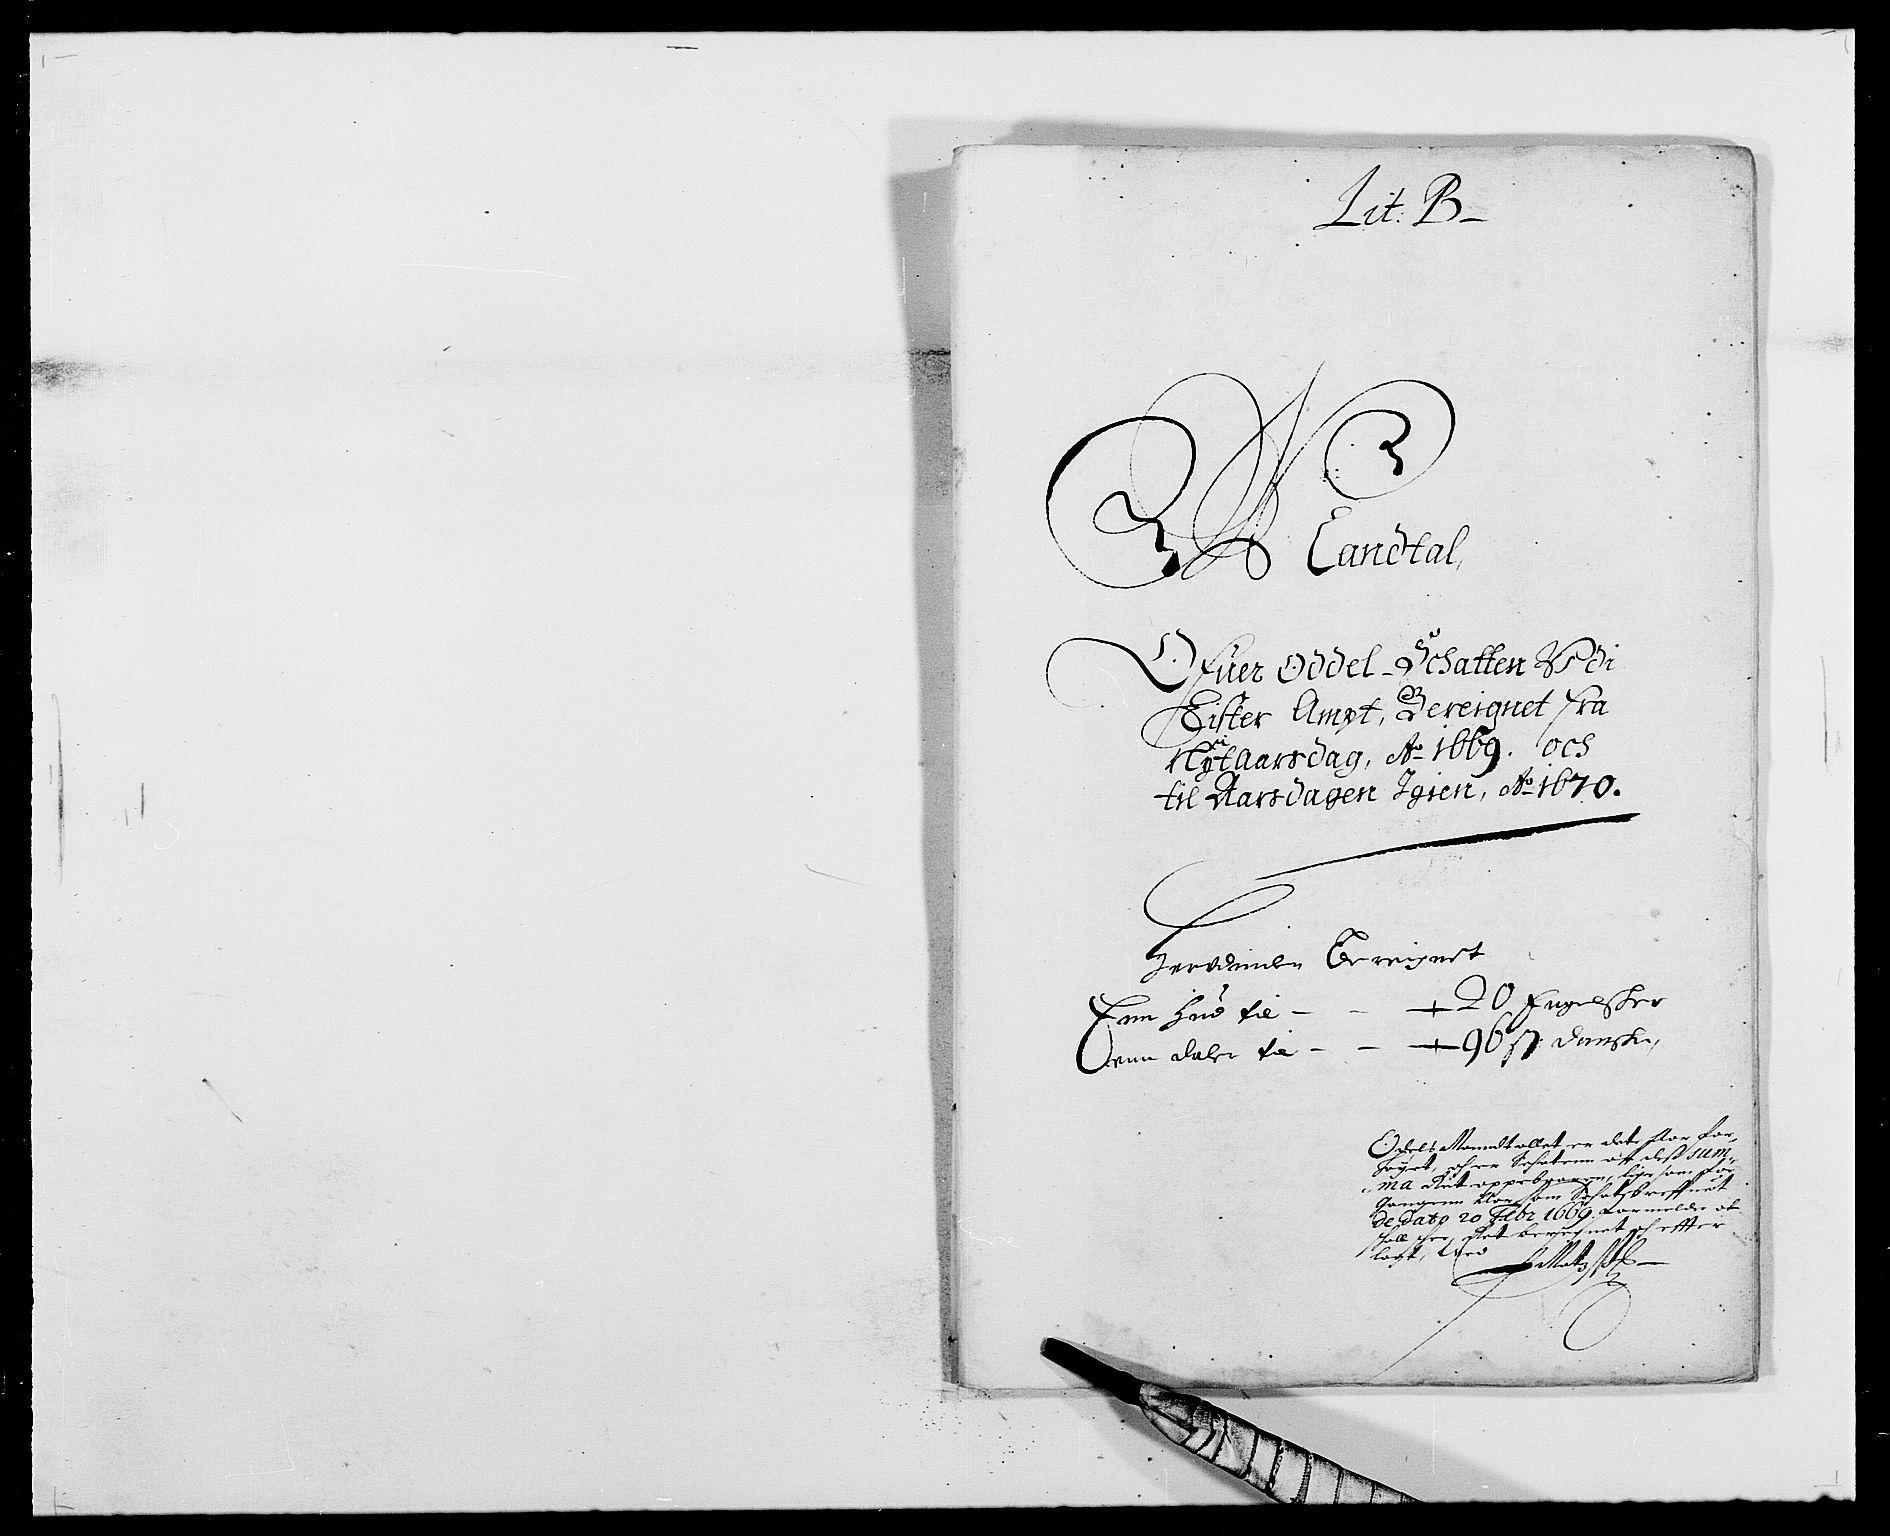 RA, Rentekammeret inntil 1814, Reviderte regnskaper, Fogderegnskap, R41/L2525: Fogderegnskap Lista, 1669-1671, s. 50